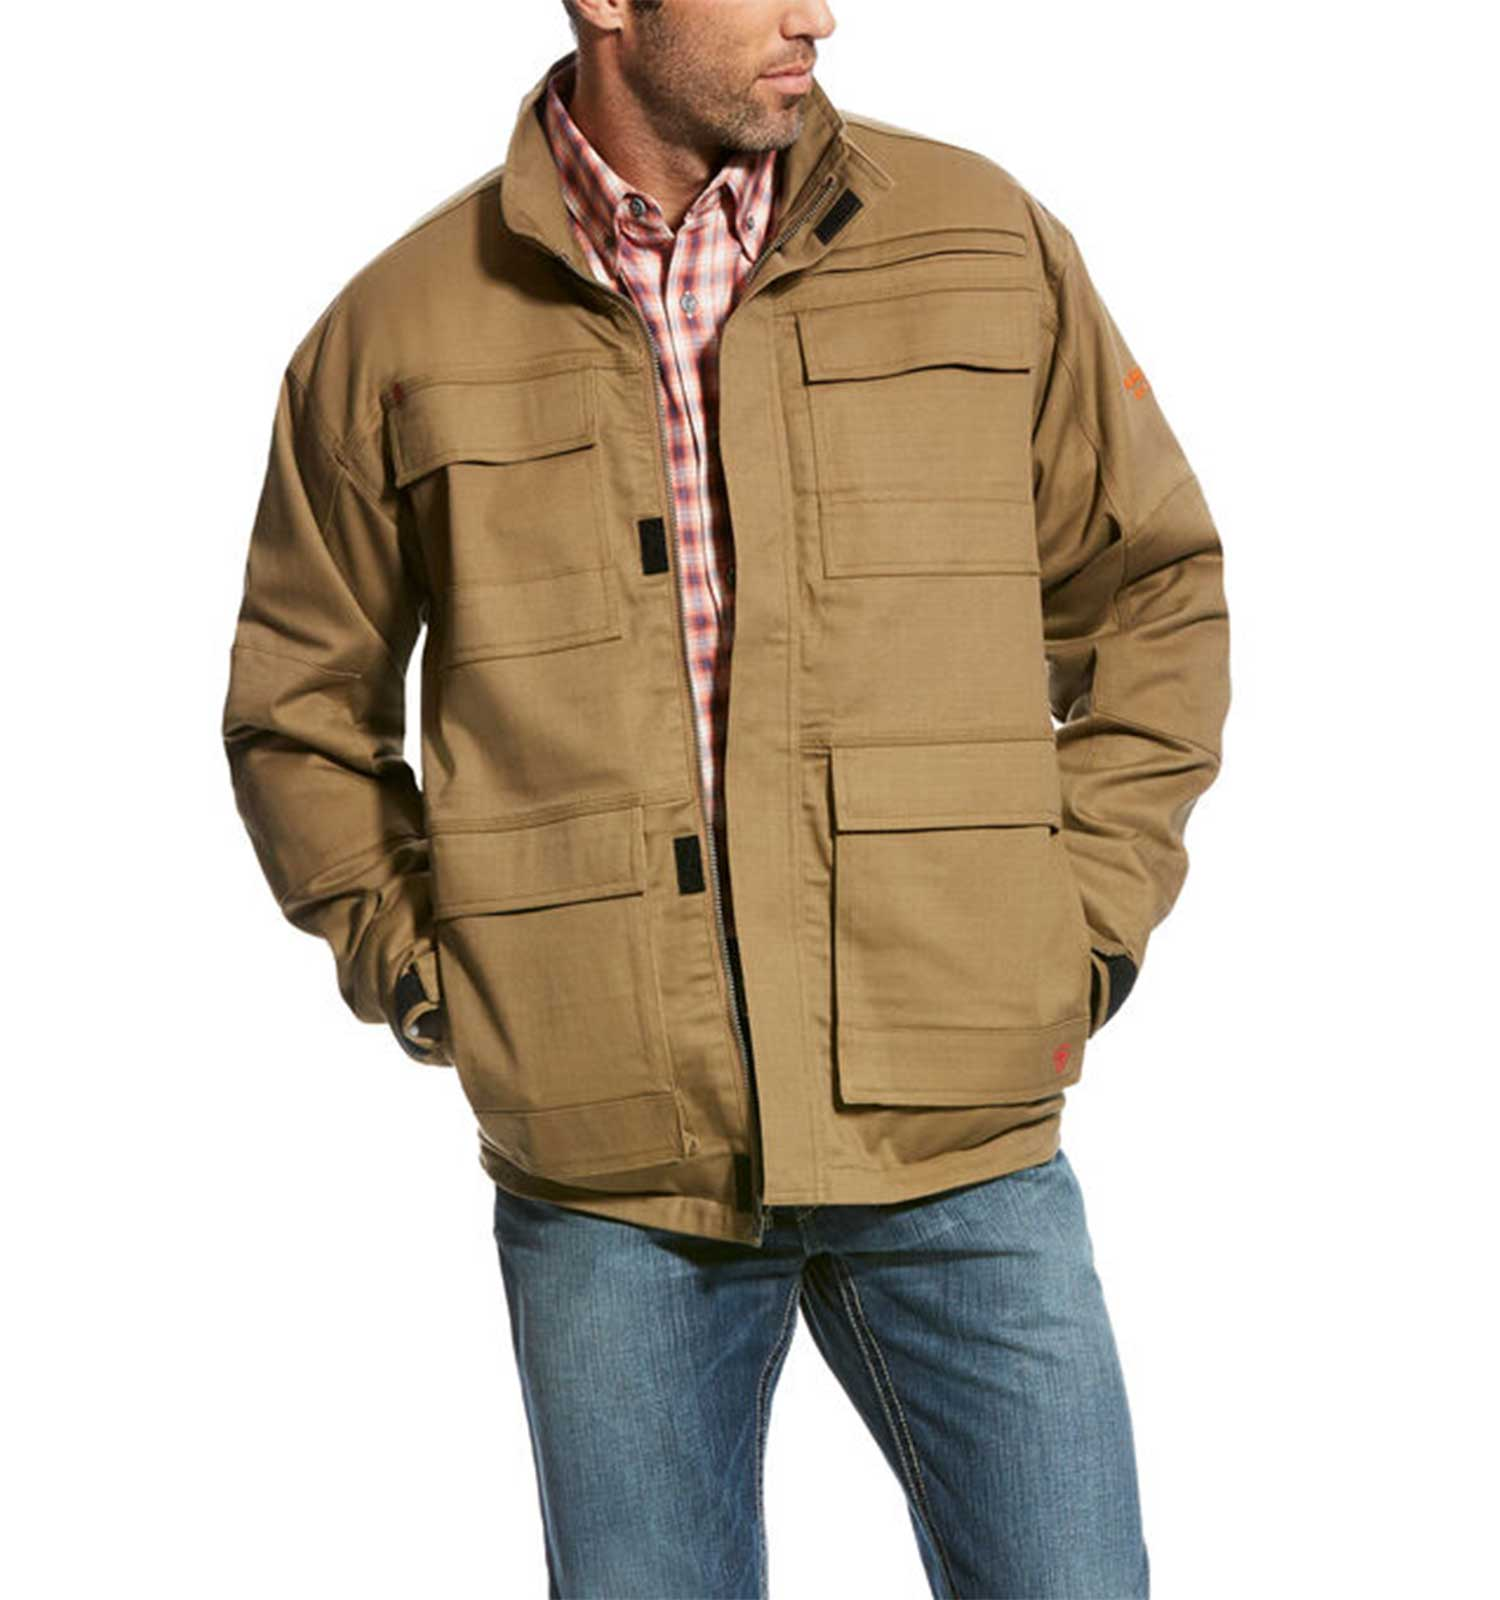 Ariat-FR-Canvas-Stretch-Jacket-Field-Khaki-Front